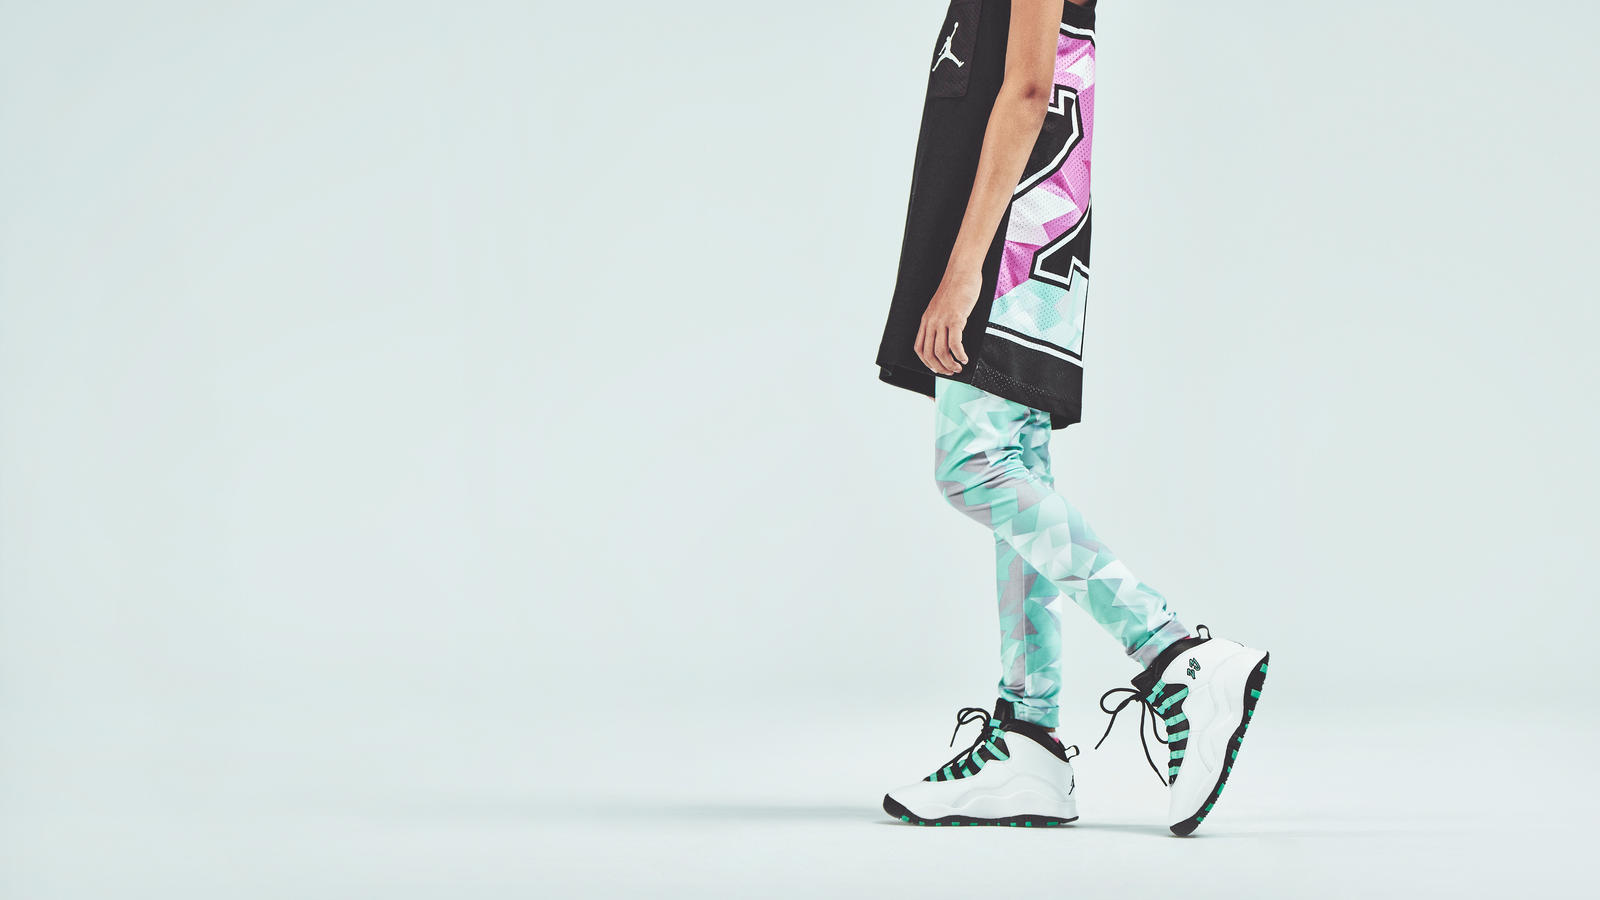 46e849c4ea25 Jordan Brand expands Grade School sizing for girls - Nike News